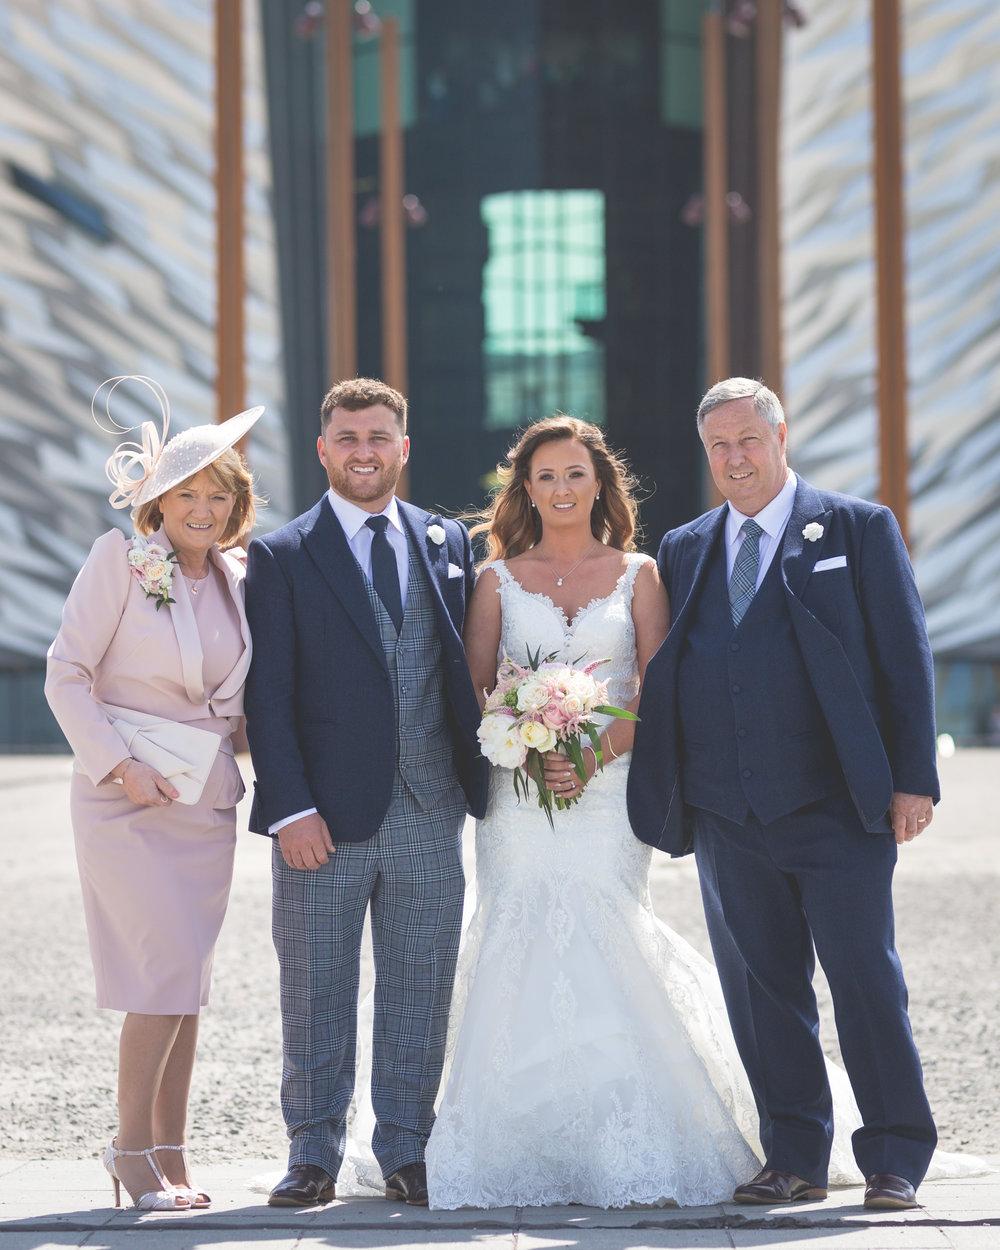 Brian McEwan | Northern Ireland Wedding Photographer | Rebecca & Michael | Portraits-31.jpg